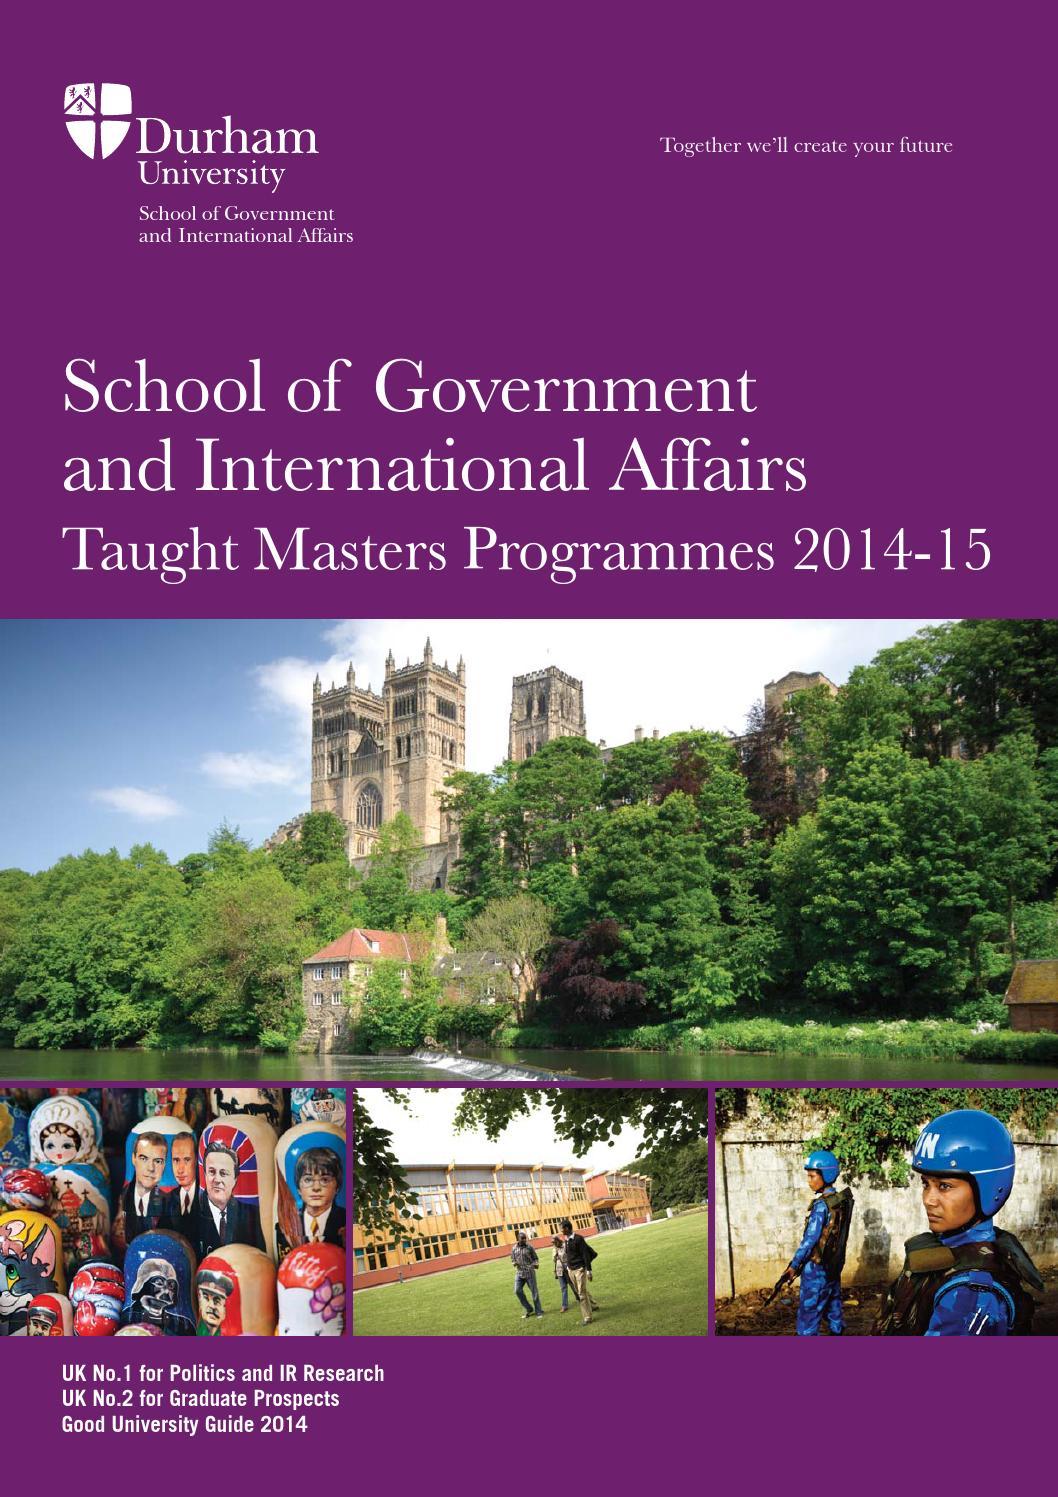 Sgia taught masters programmes 2014 15 by durham - Durham university international office ...